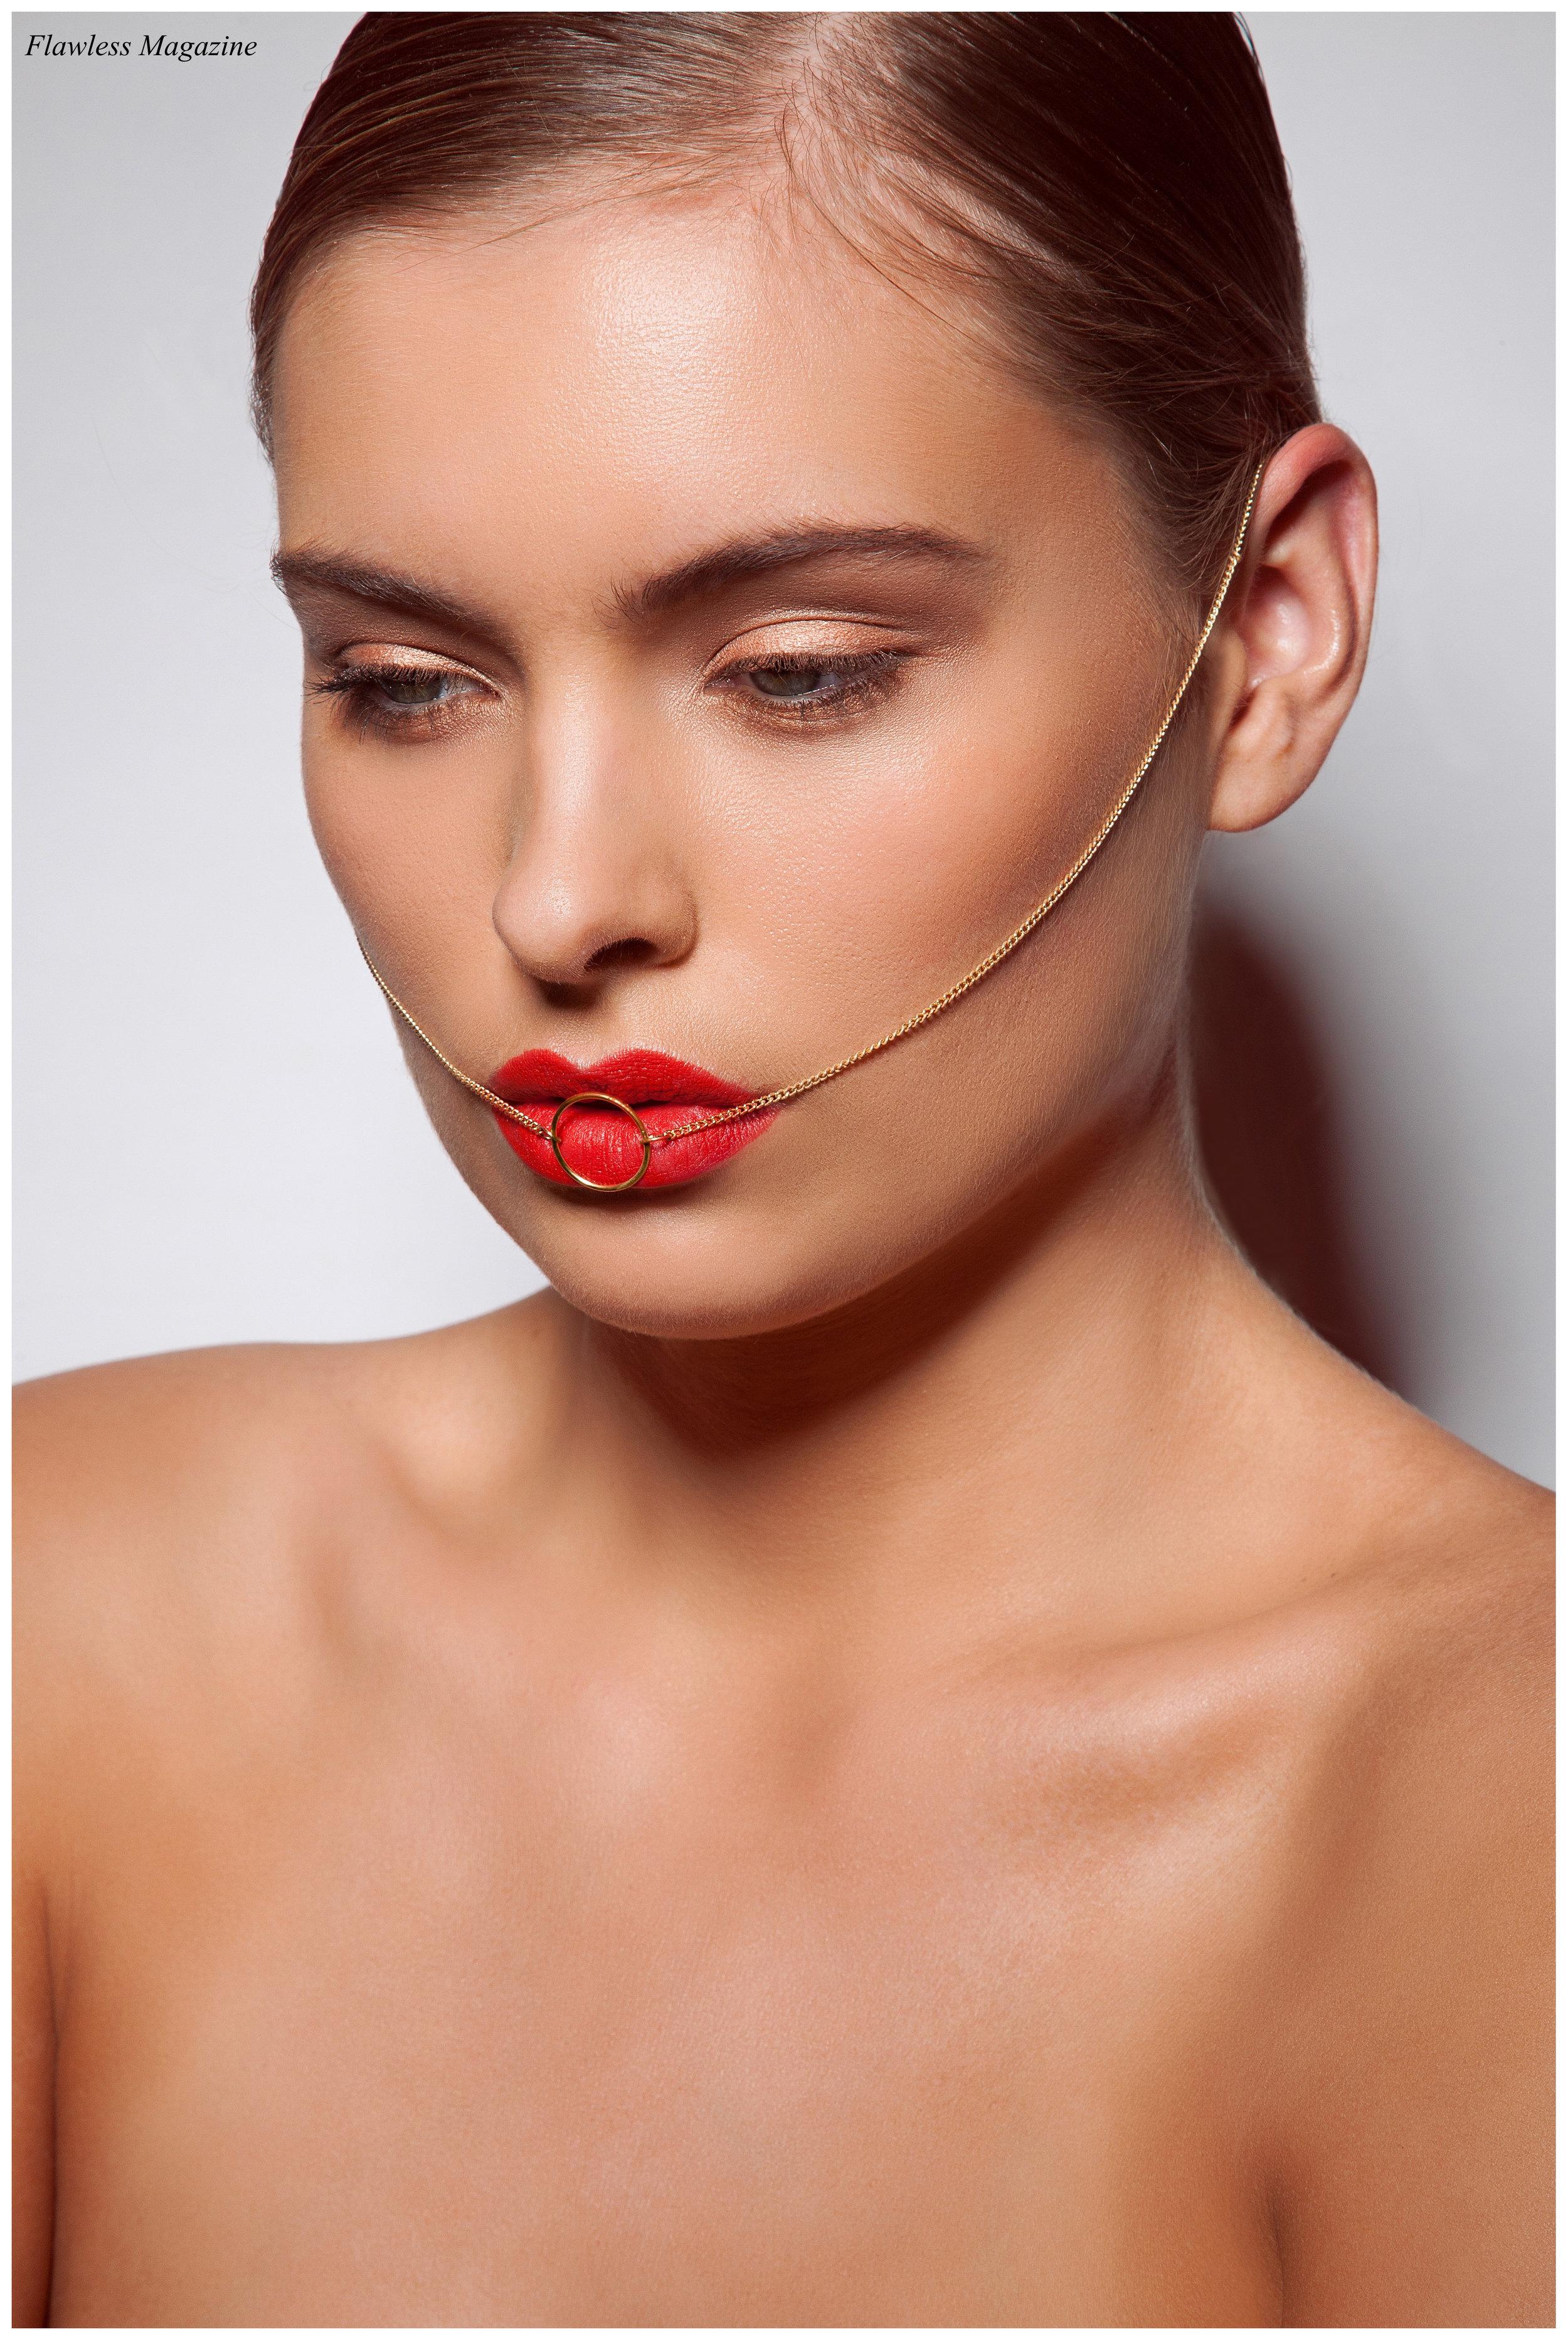 Flawless-Magazine_Subtle-Beauty1.jpg